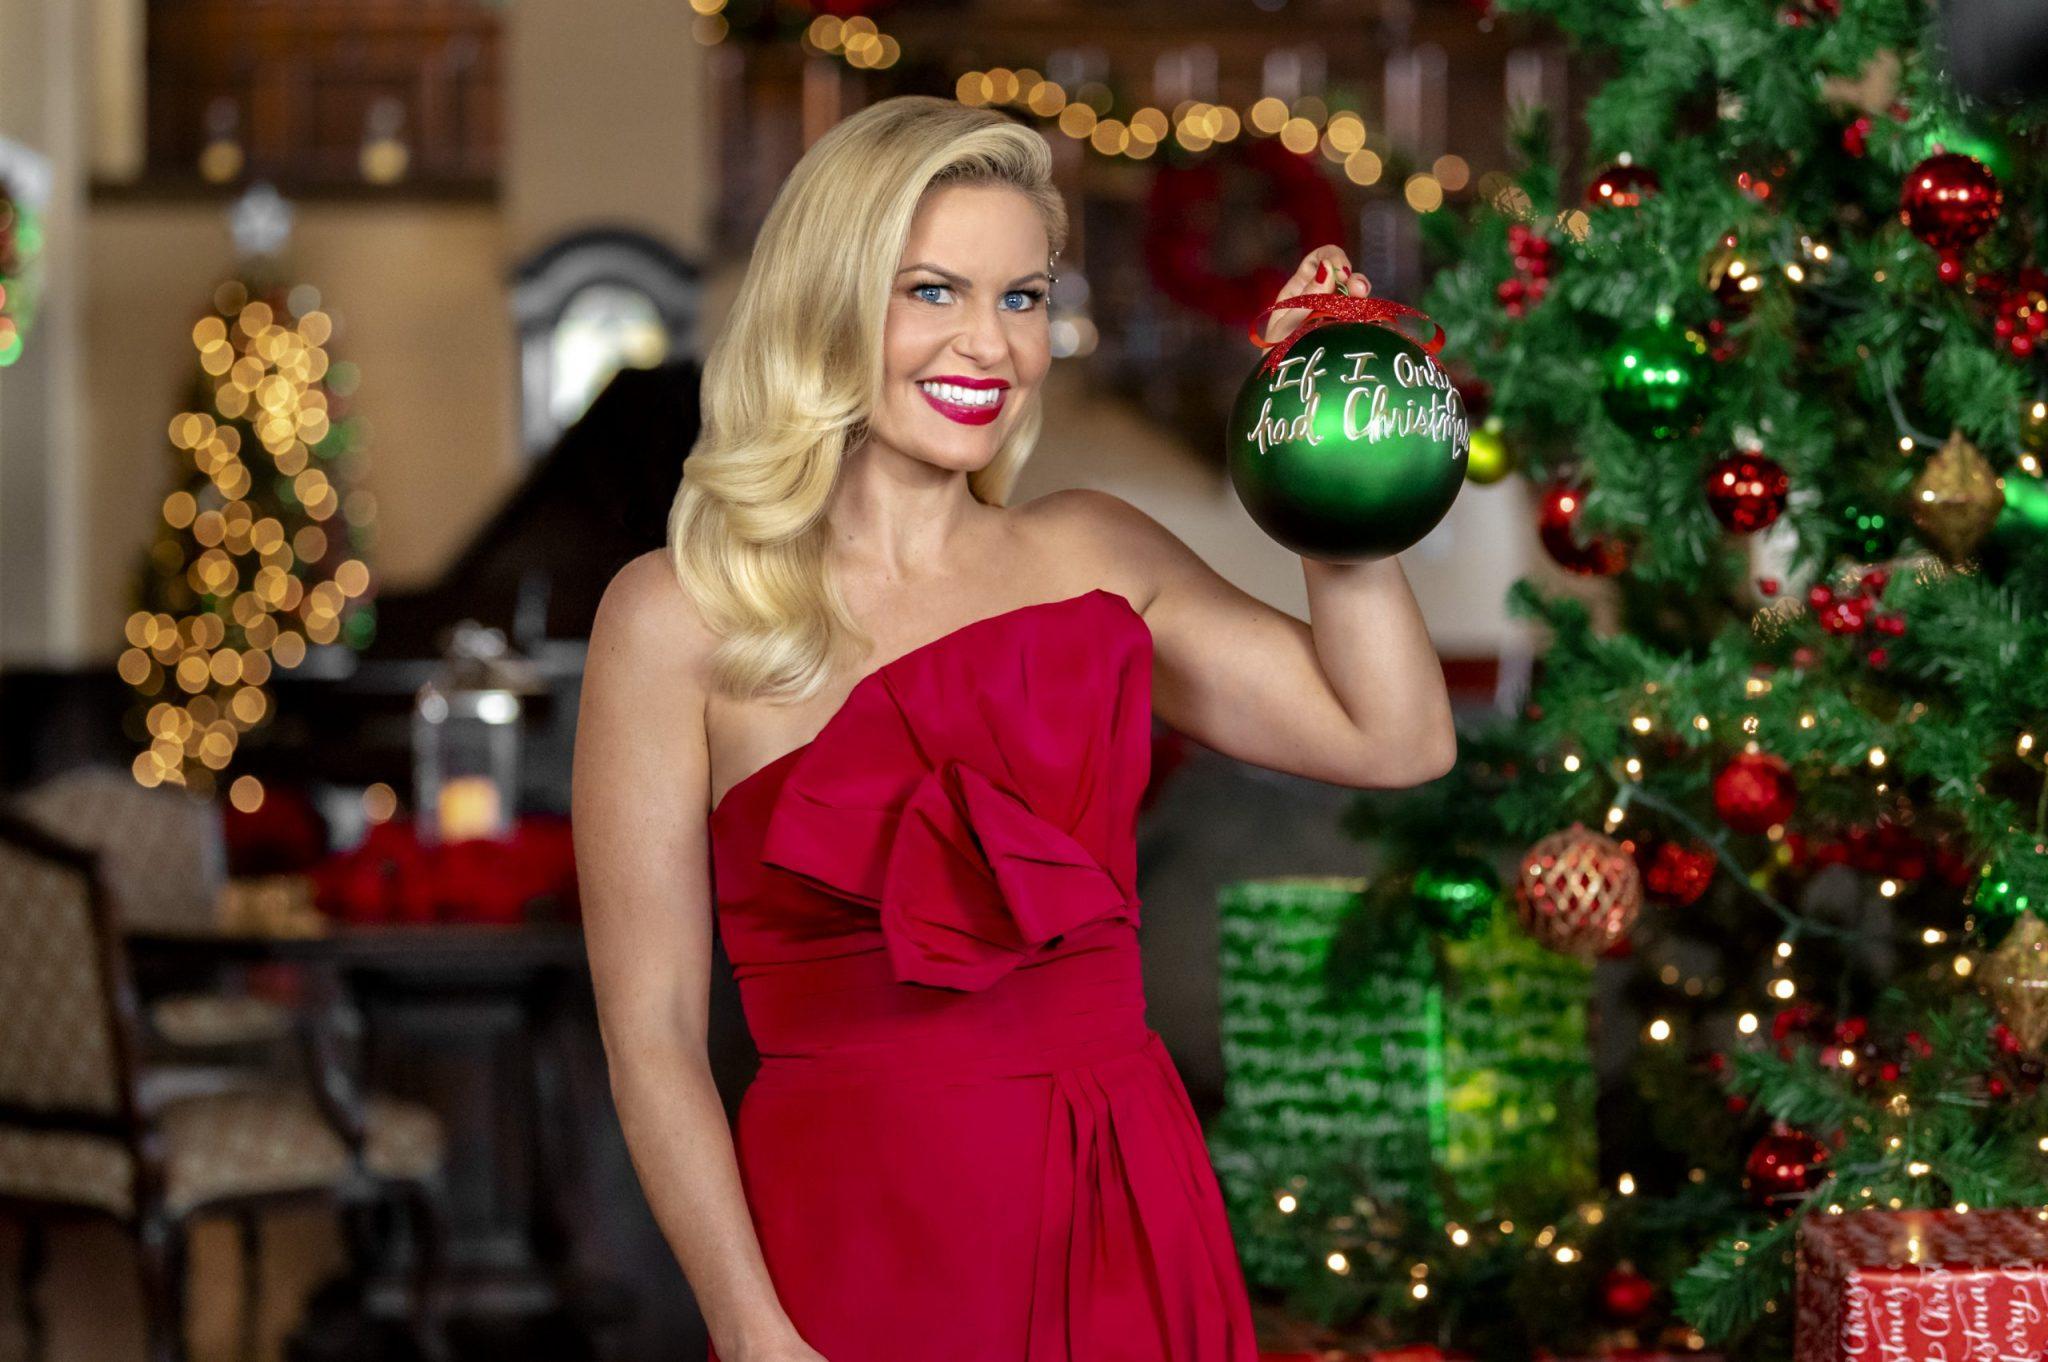 Hallmark Christmas, Candace Cameron Bure Credit: ©2020 Crown Media United States LLC/Photographer:Kim Nunneley/Alexx Henry Studios, LLC